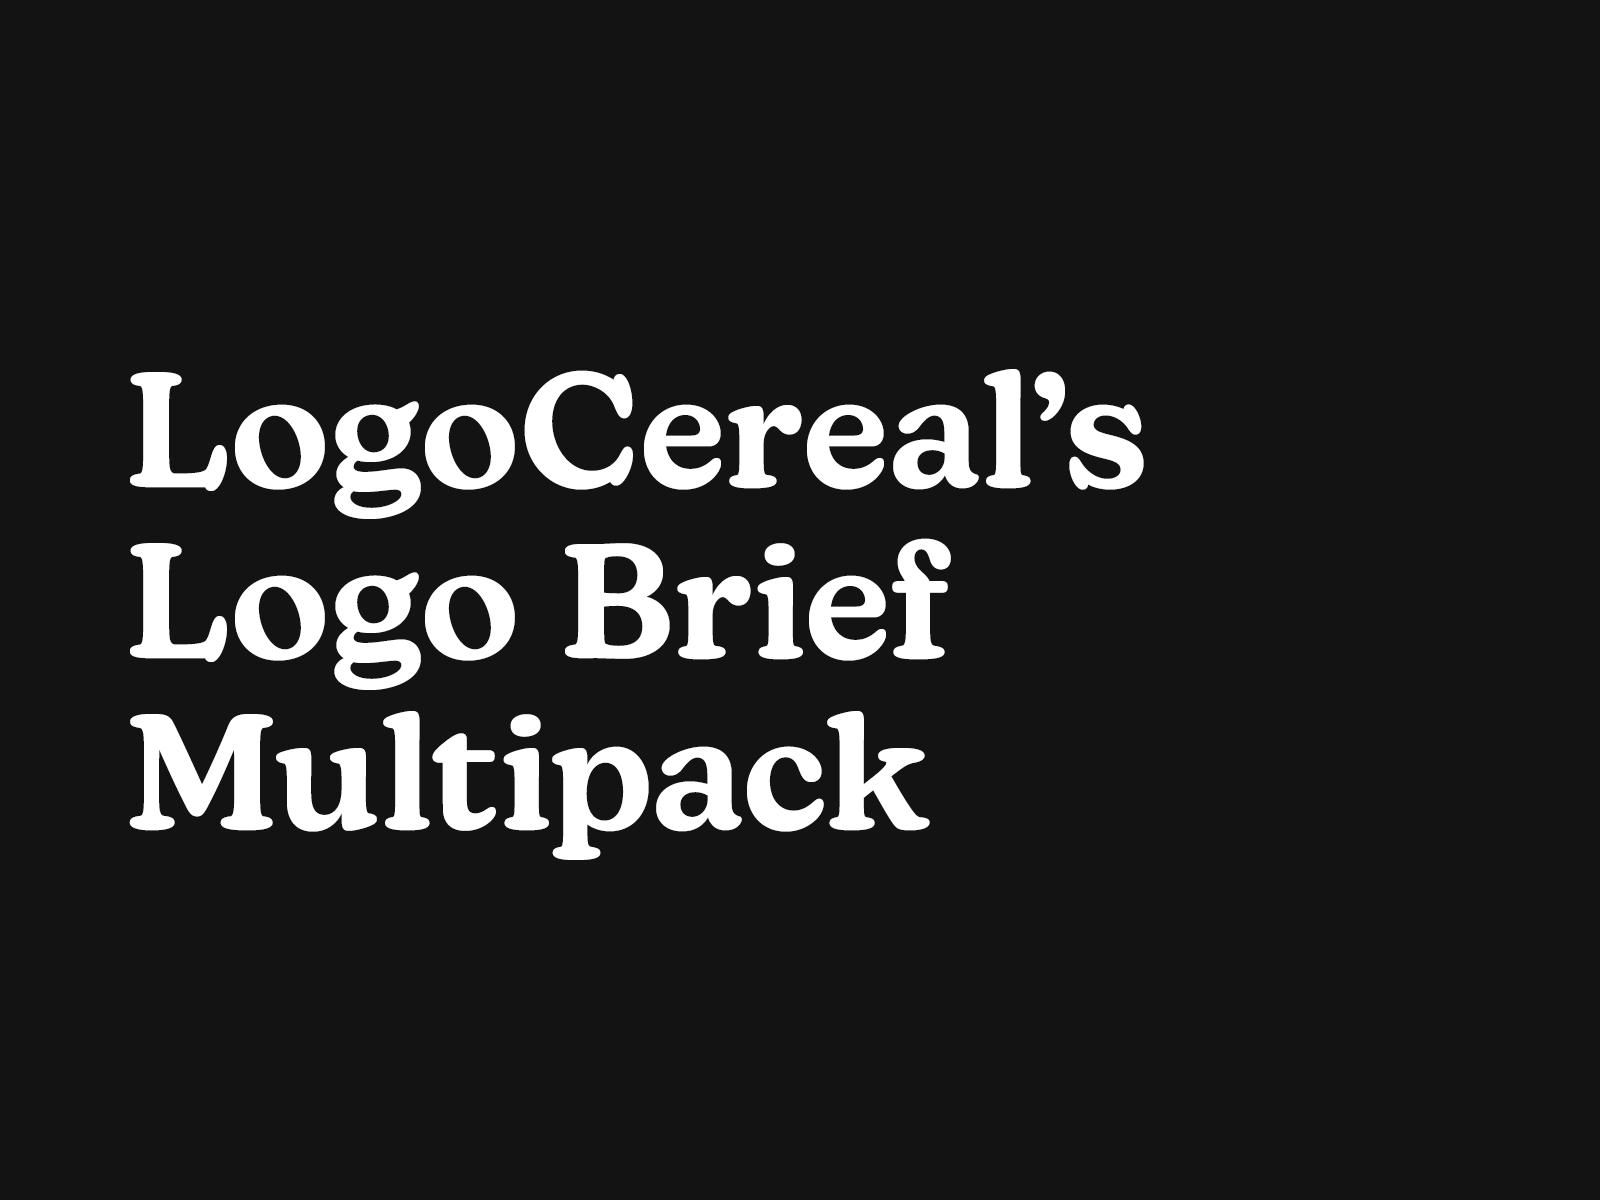 LogoCereal's Logo Brief Multipack